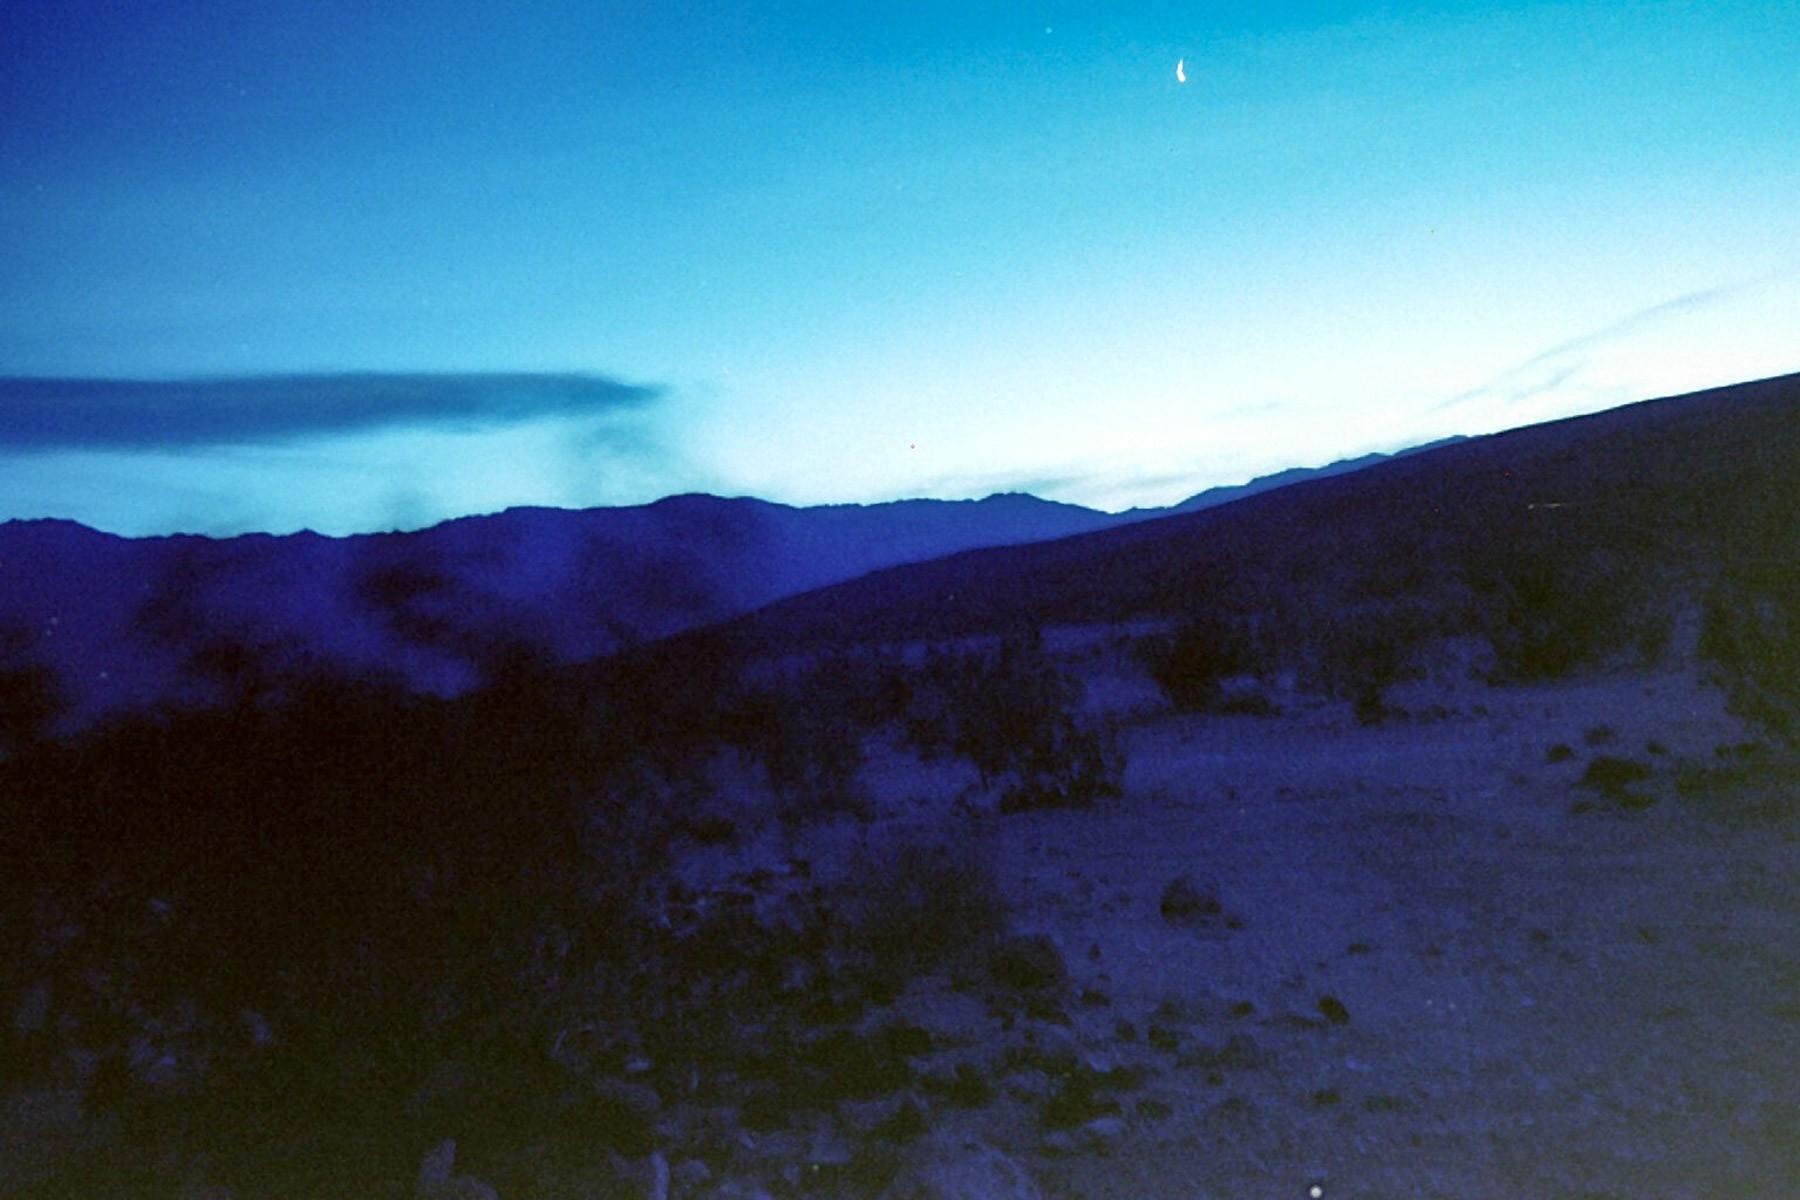 674D.V.-096-Canon-A1 Storie di Luce